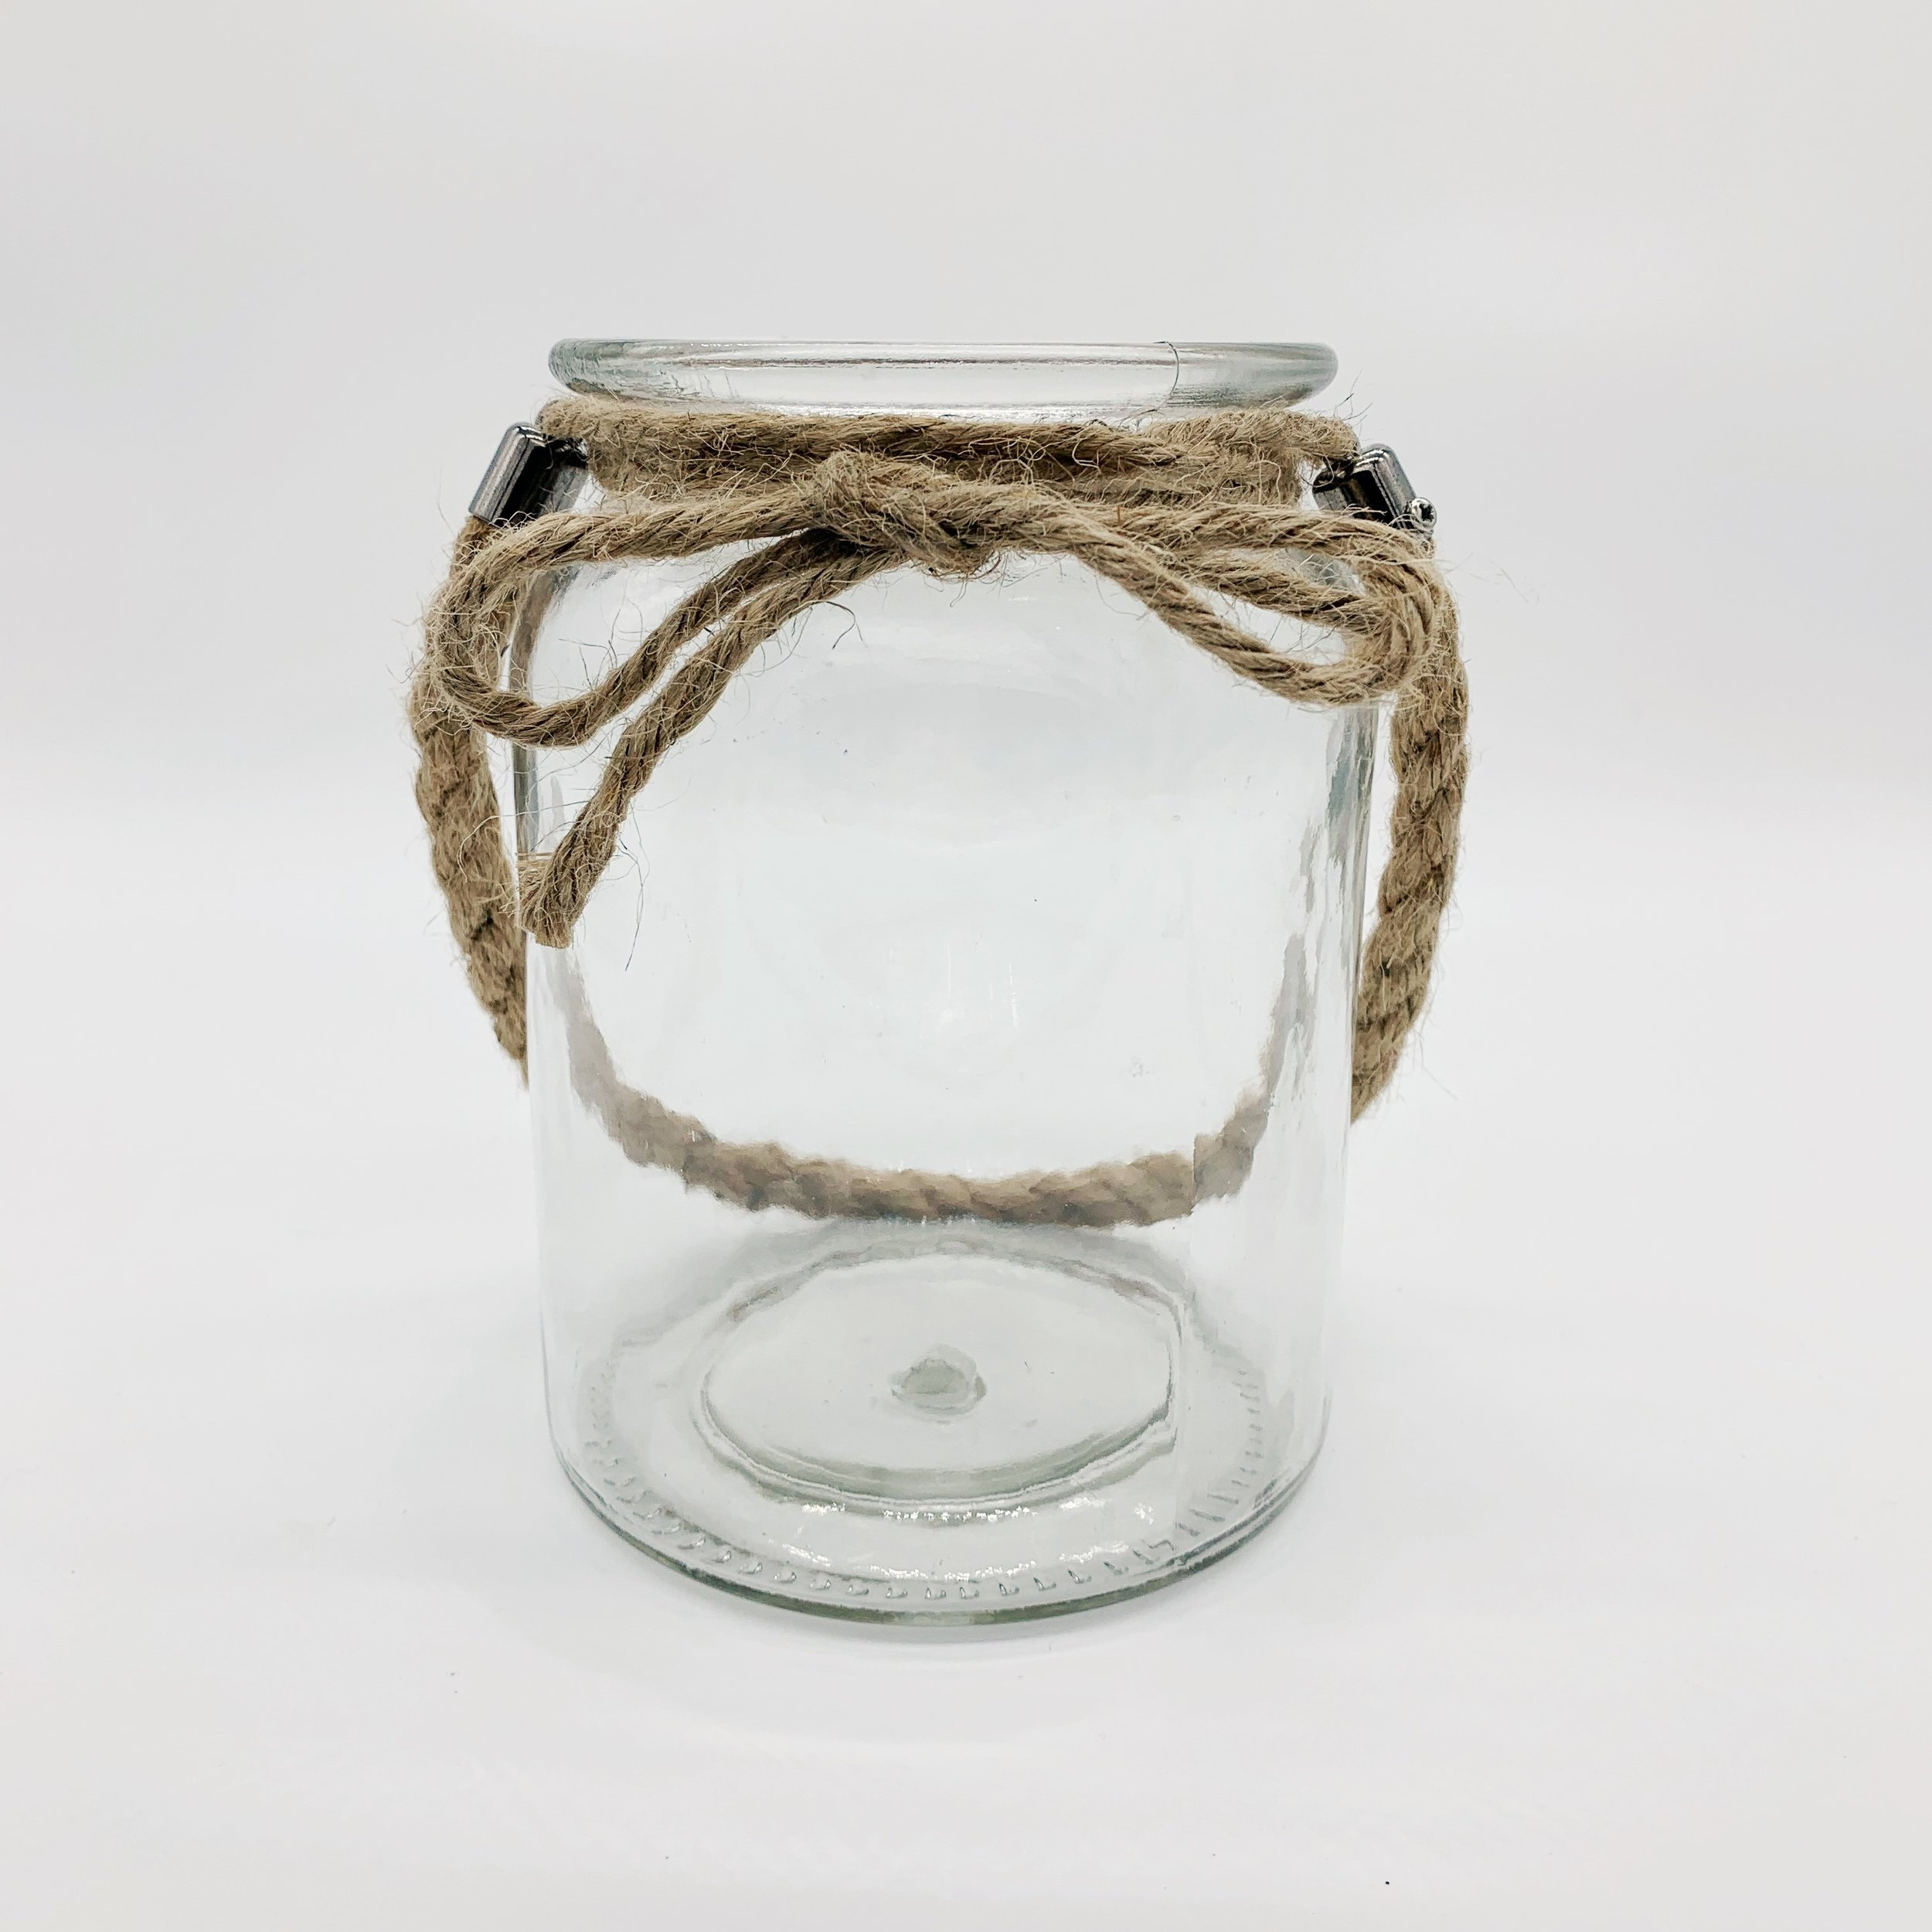 Rustic jar  Price: $3.00  Qty: 10